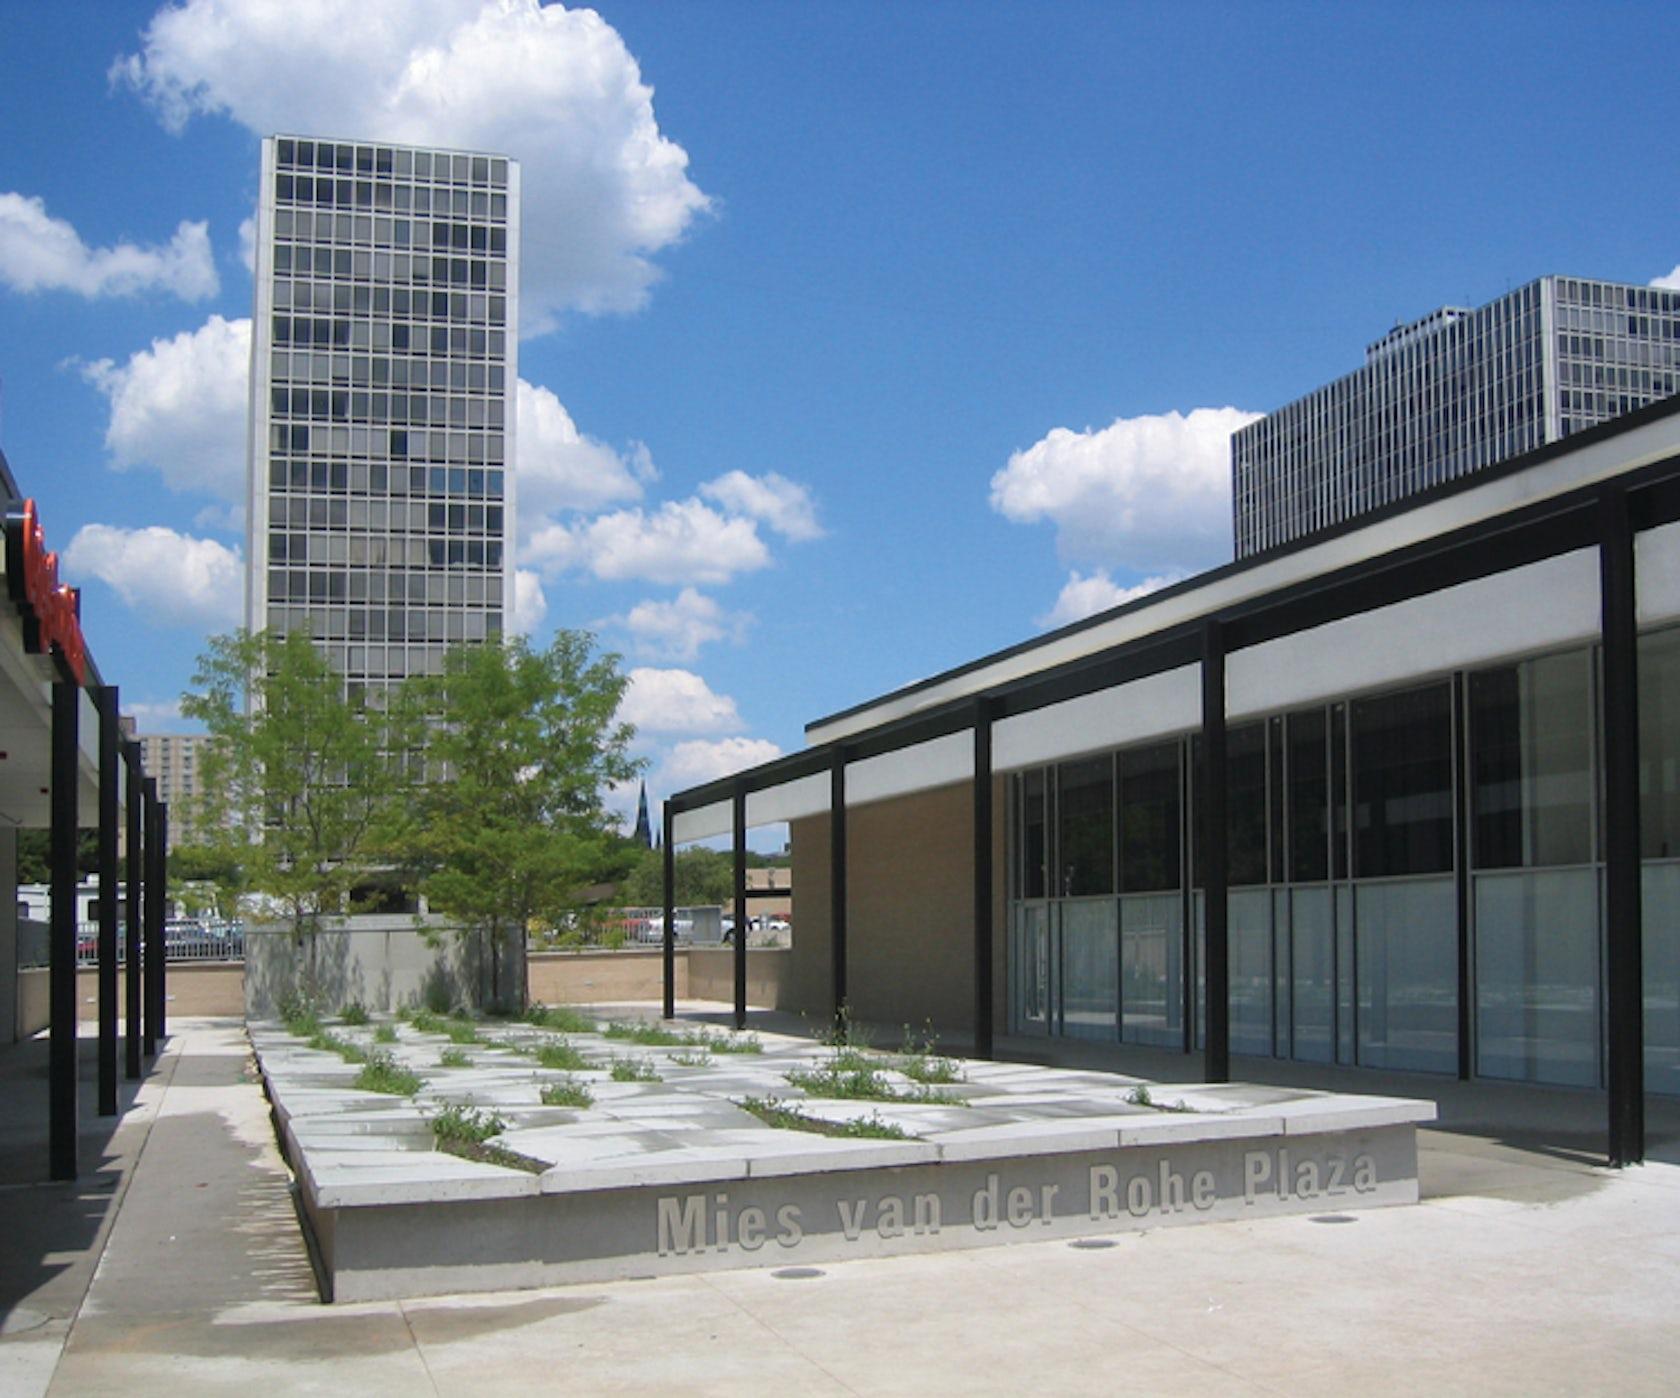 Mies Van Der Rohe Plaza Architizer